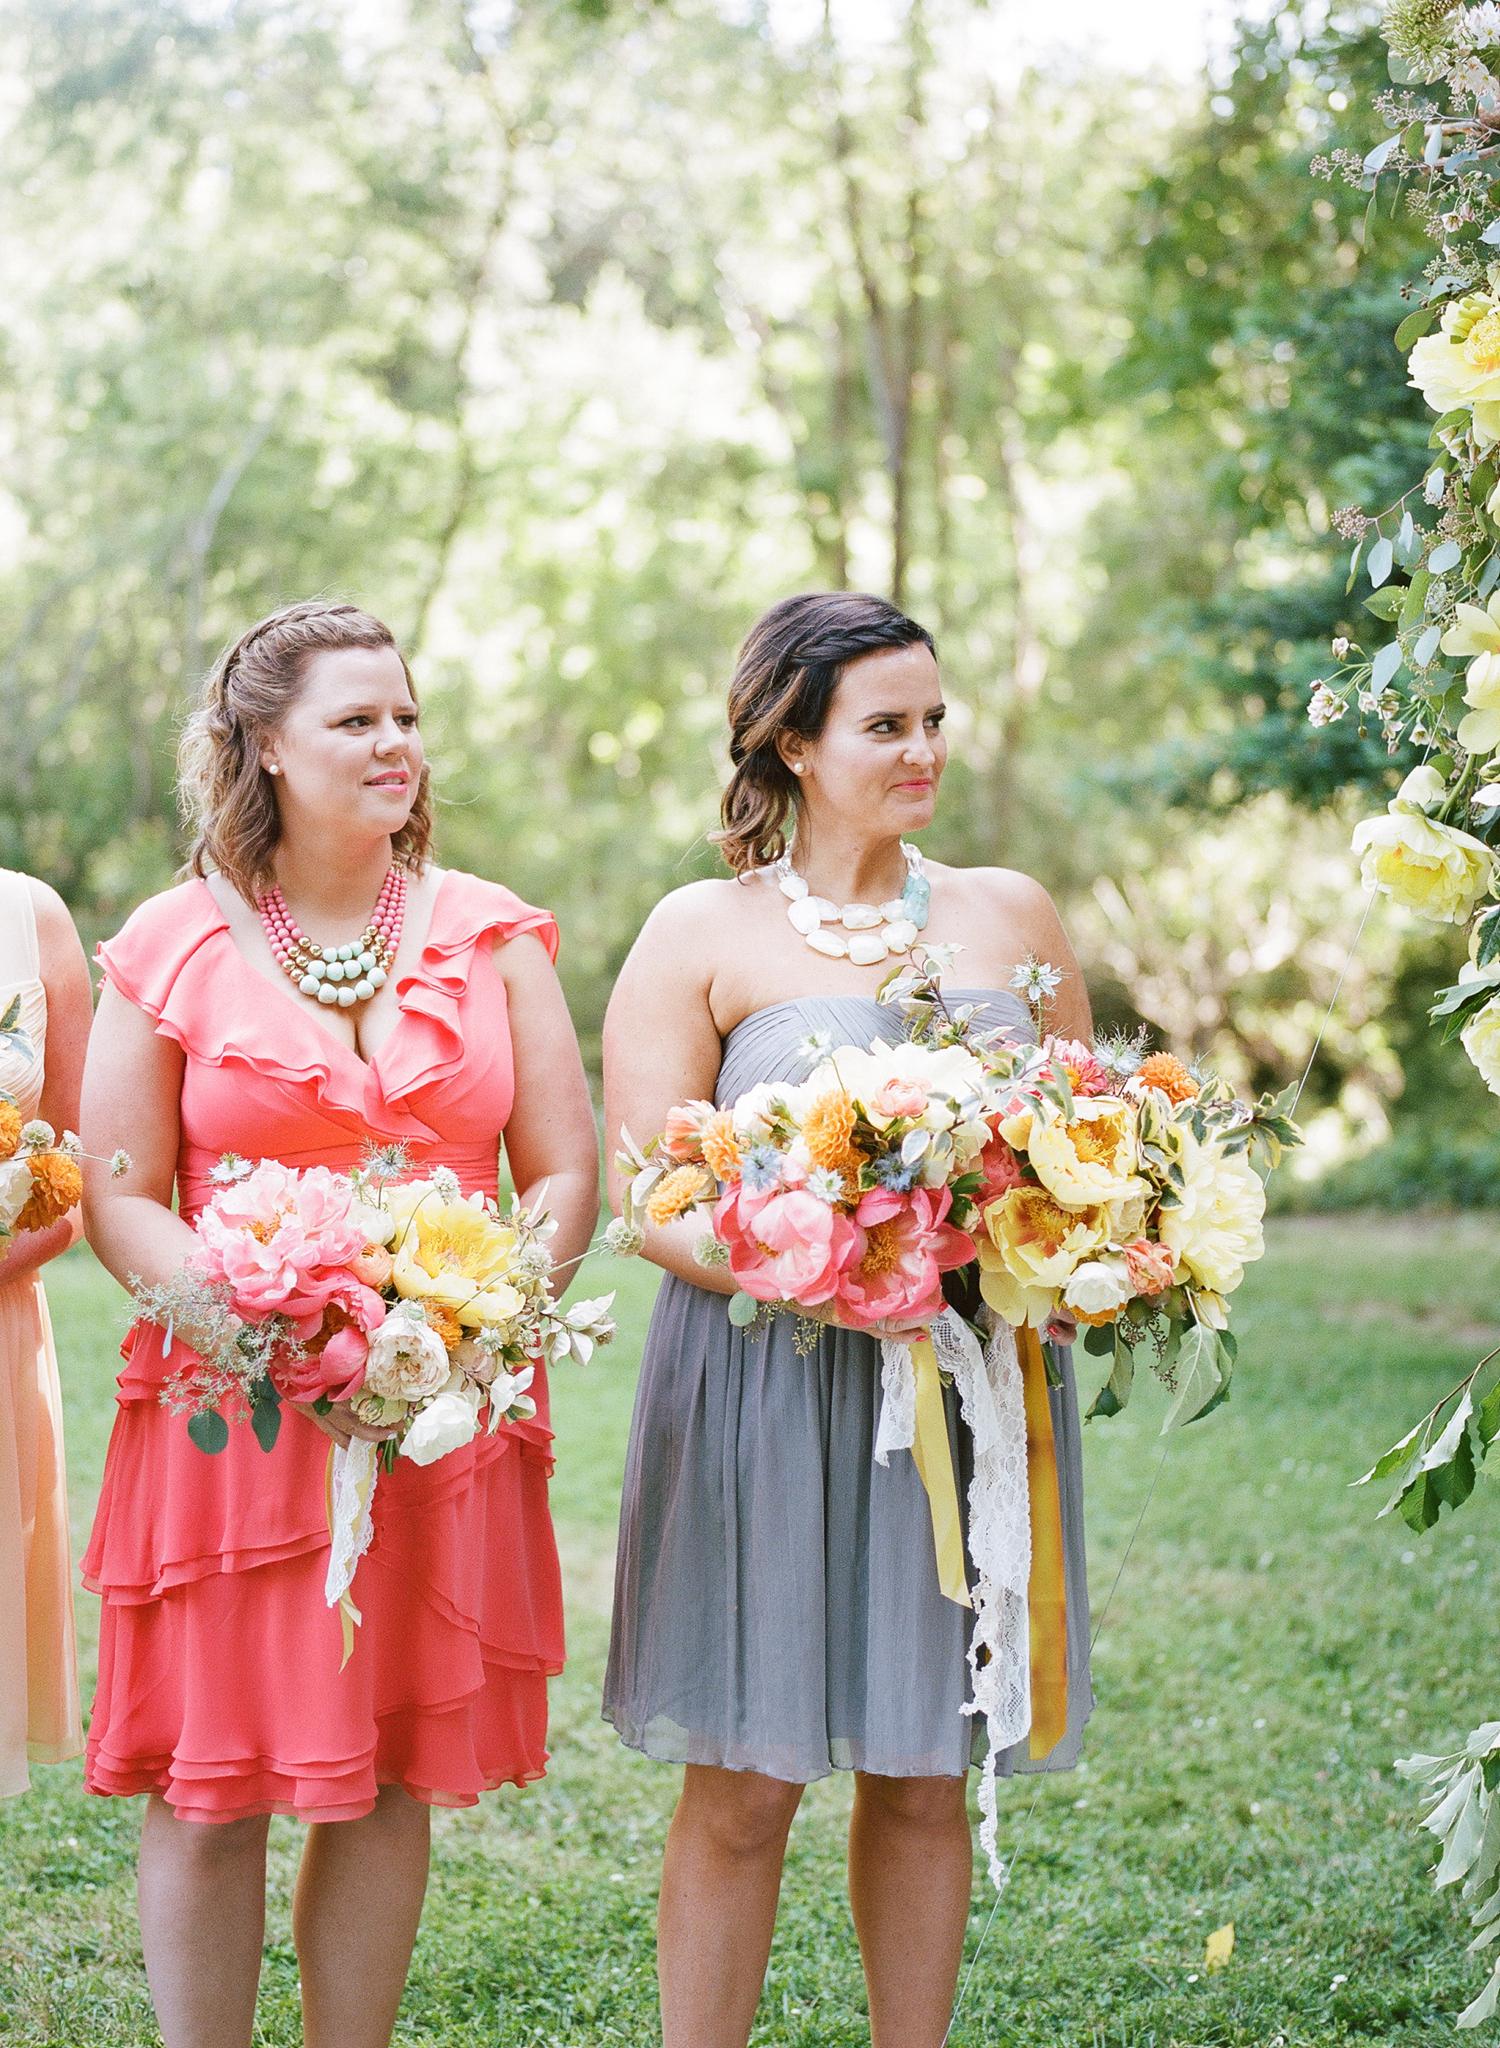 17-bridesmaids-wedding-peony-bouquet.jpg